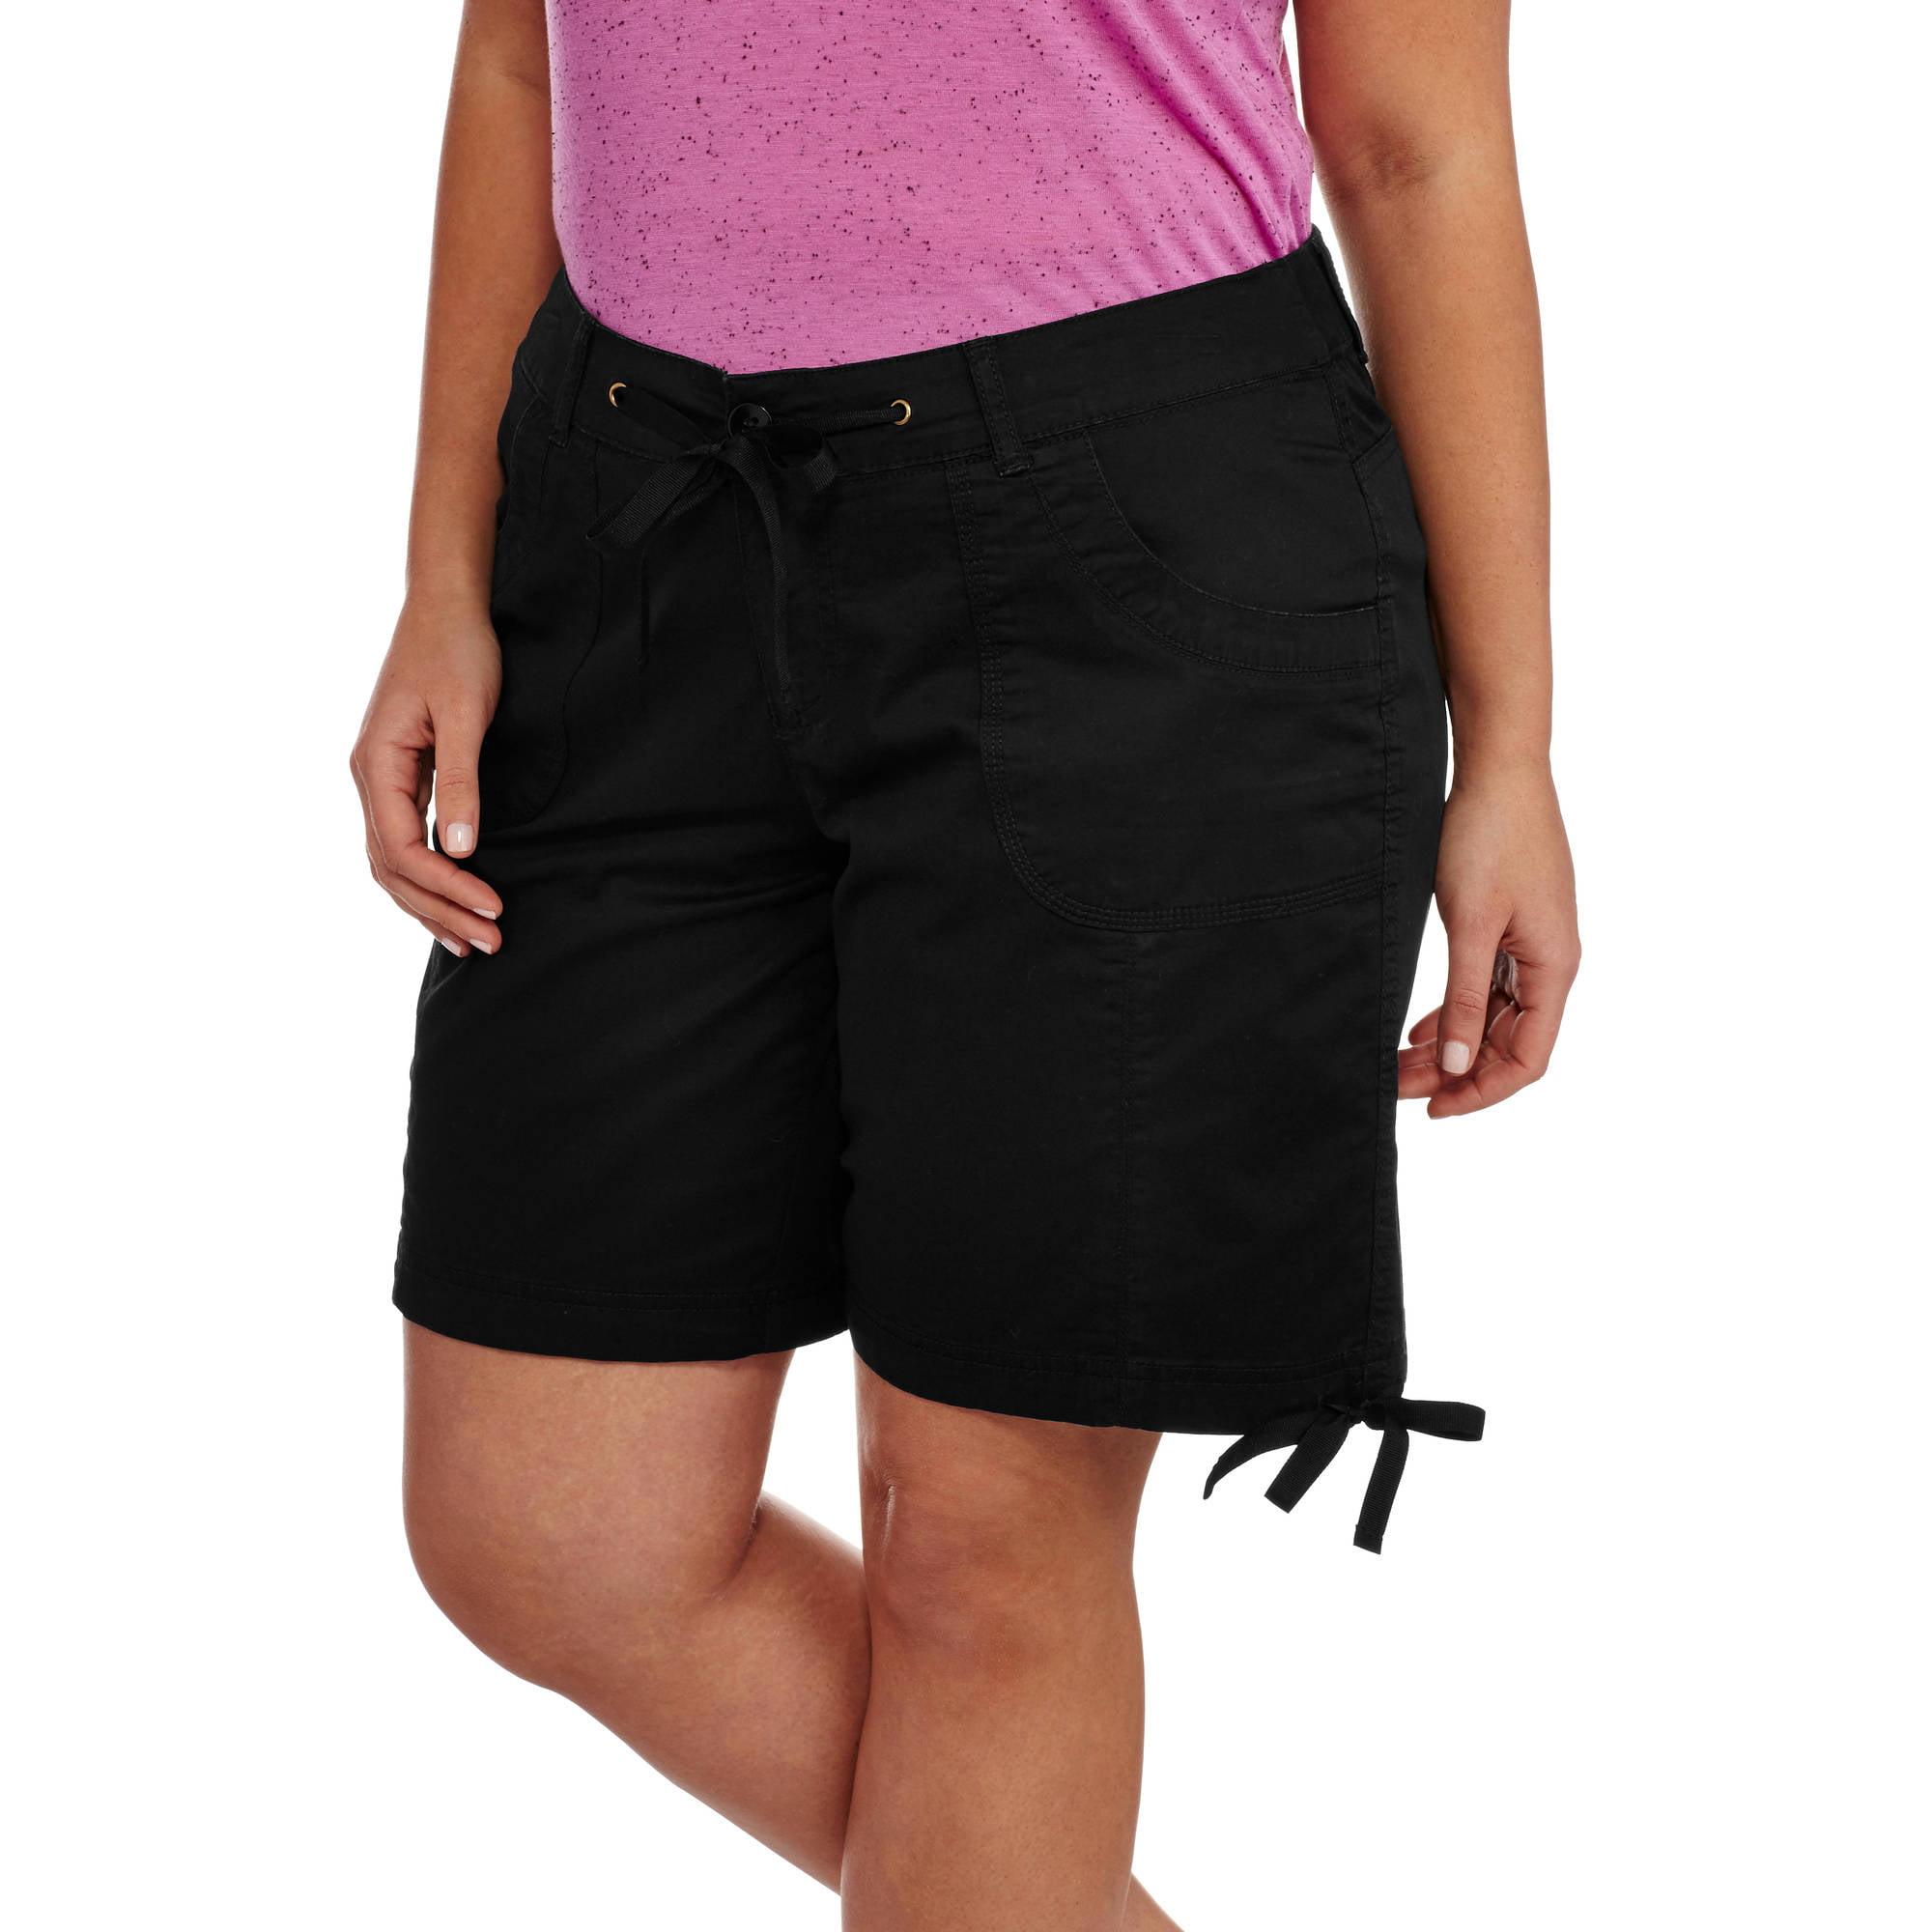 Faded Glory Women's Plus Twill Shorts